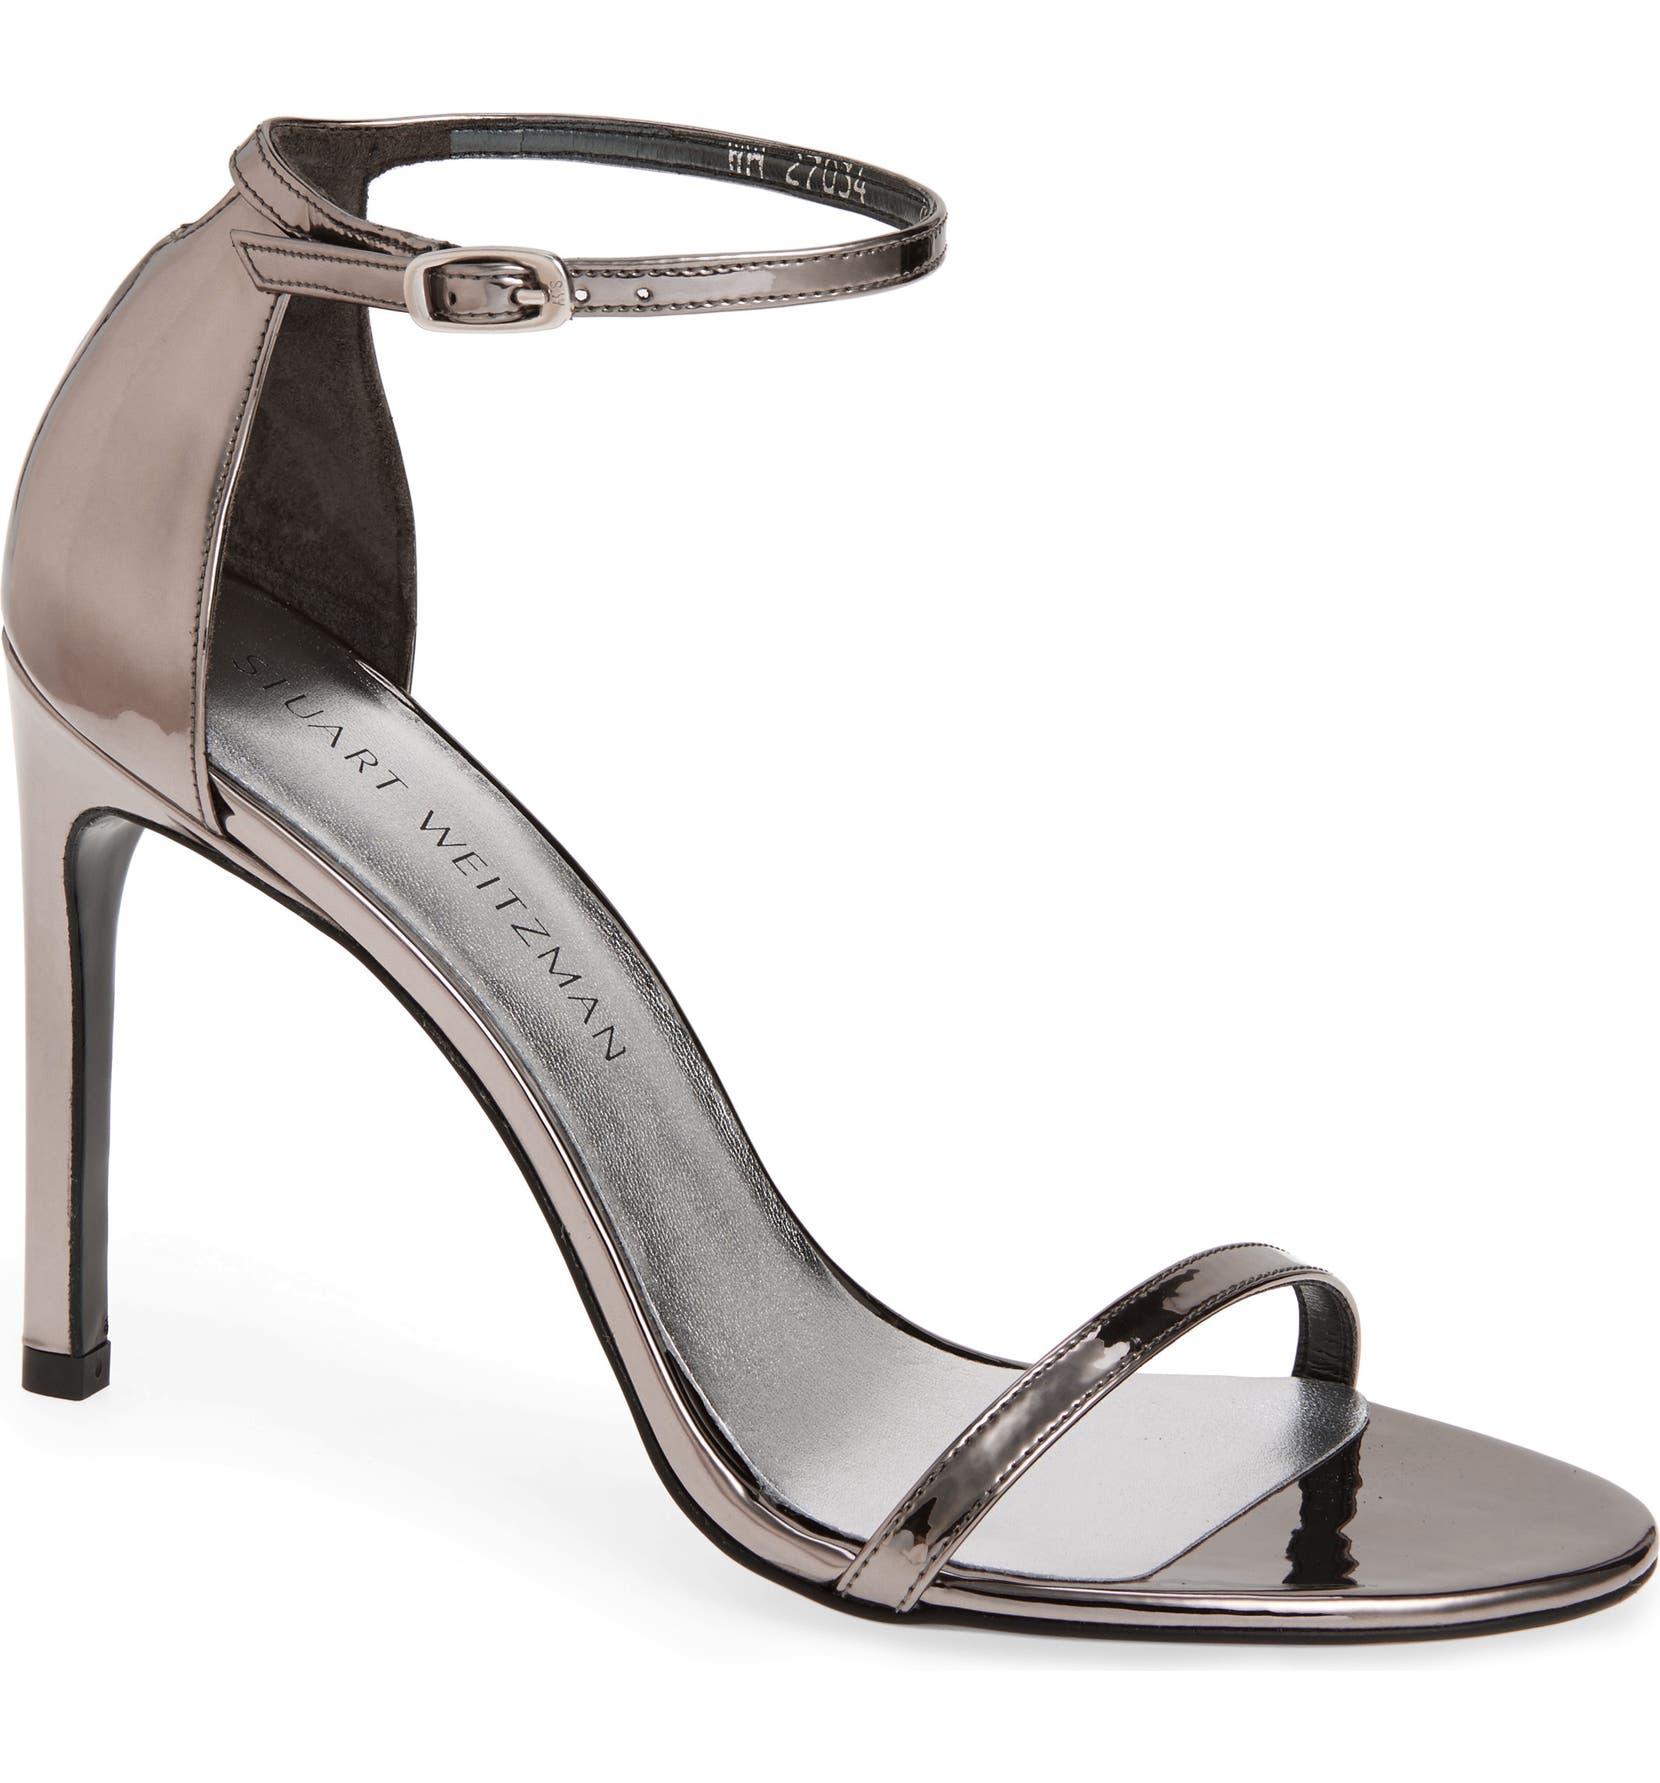 c6a8b6e0e6cc Stuart Weitzman Nudistsong Ankle Strap Sandal (Women)